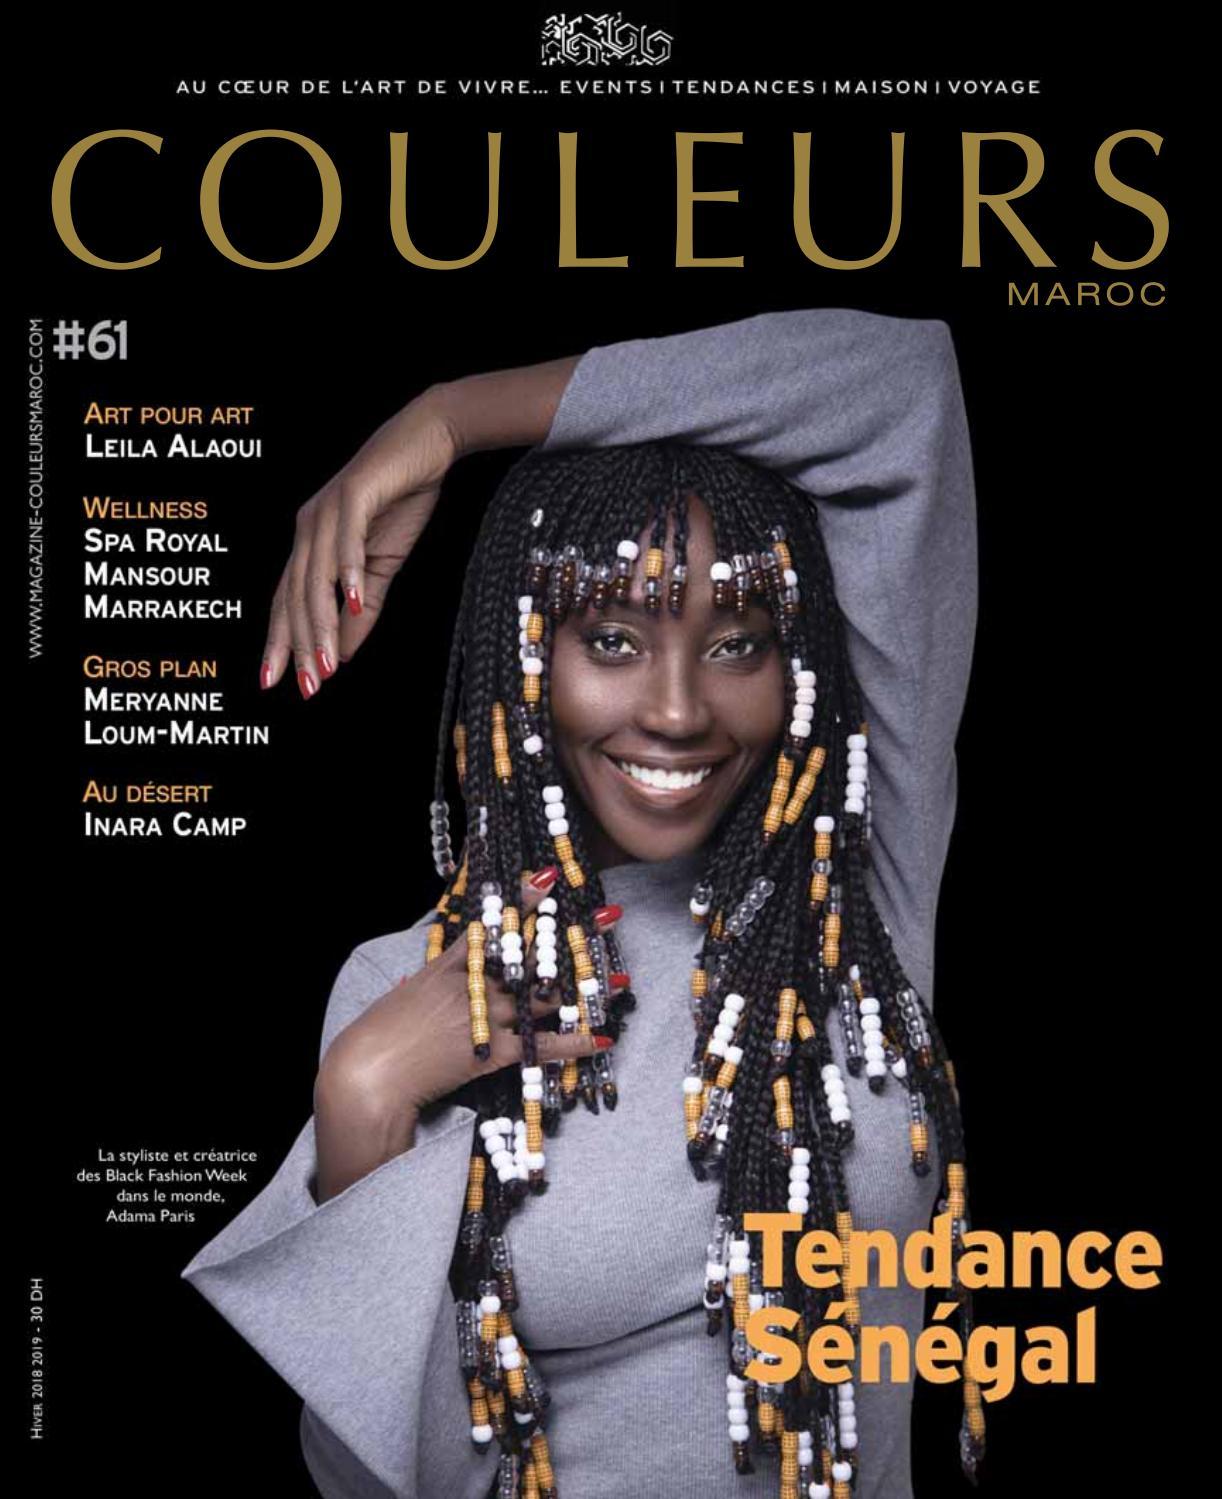 COULEURS MAROC N61 by ArtpourArt - issuu 6c86f1735882